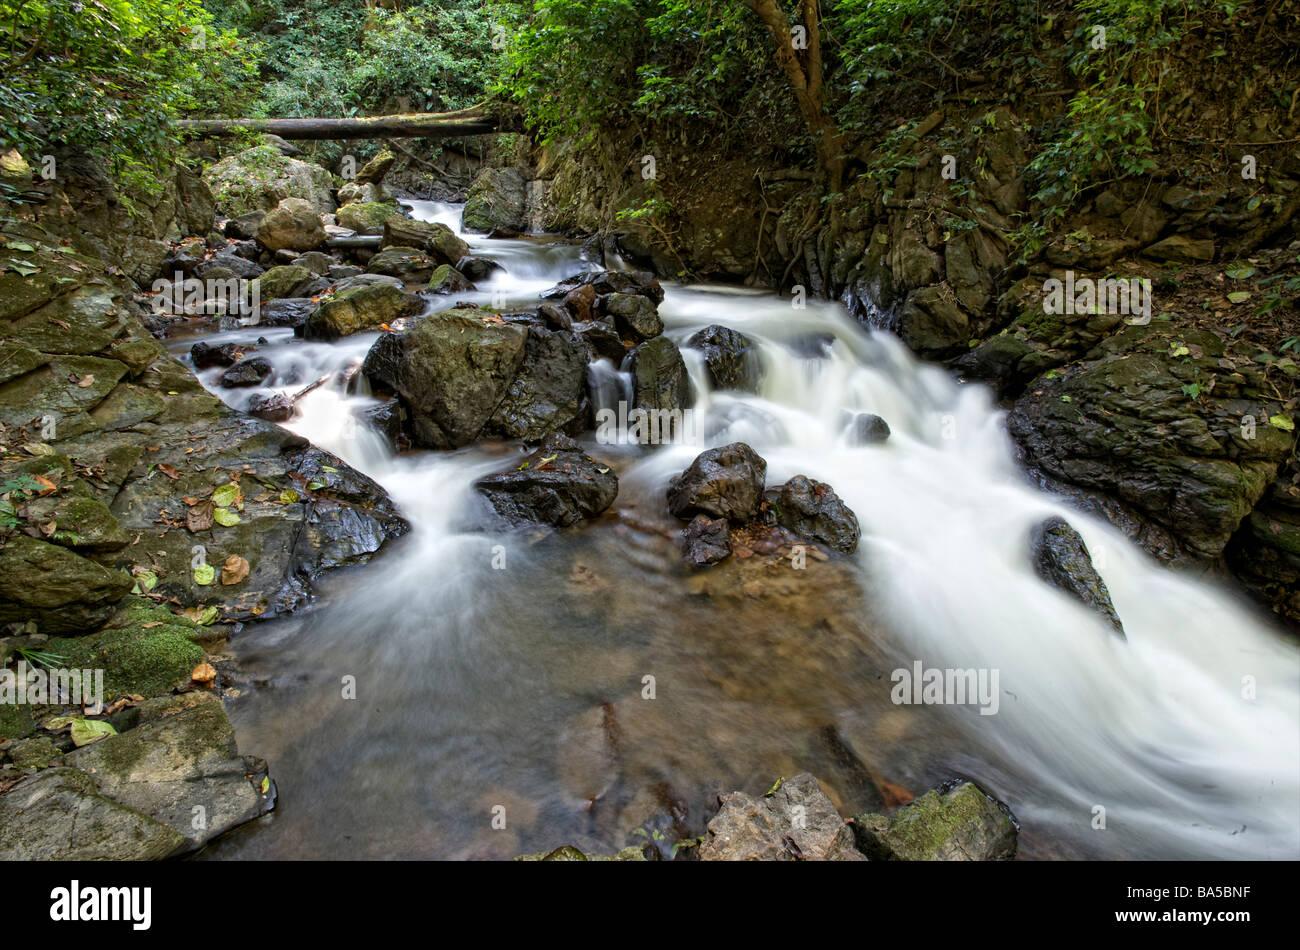 The Mae Surin waterfall at the Mae Surin National Park in Mae Hong Son Thailand - Stock Image